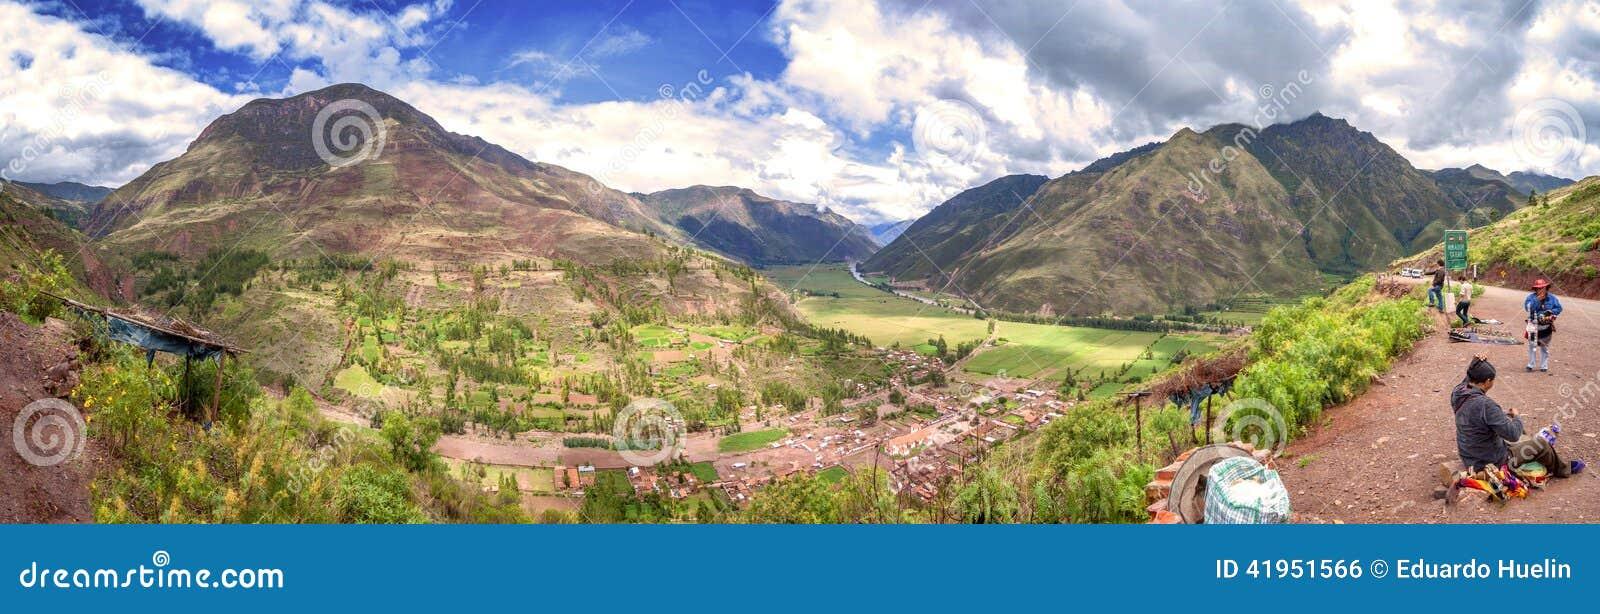 URUBAMBA PERU, GRUDZIEŃ, - 09: Panoramiczny widok Urubamba inka Święta dolina, Grudzień 09, 2011 w Urubamba, Cusco, Peru